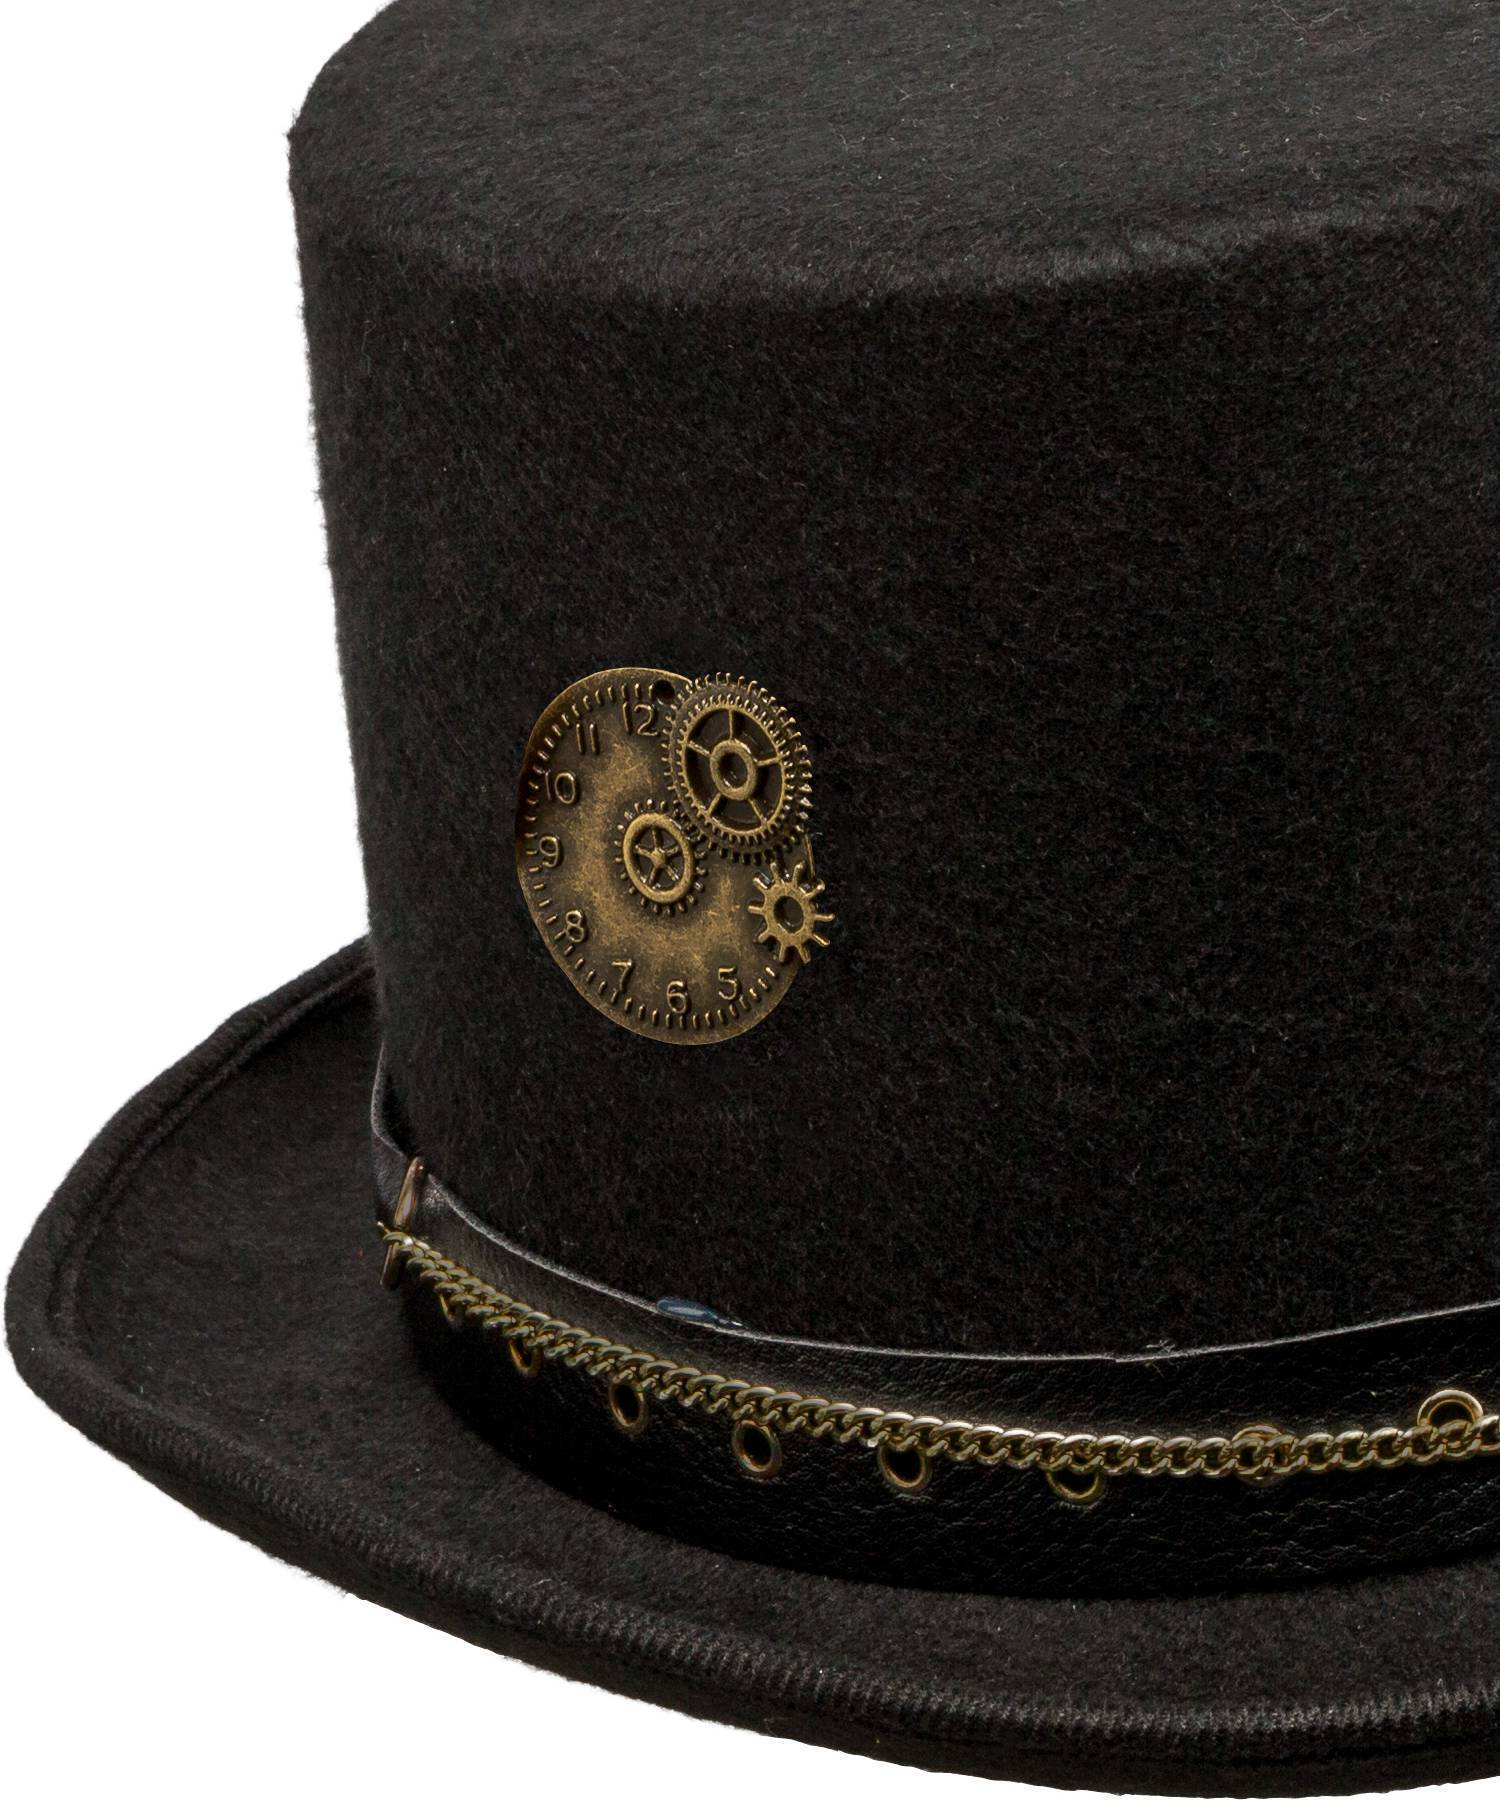 Chapeau-Steampunk-noir-2